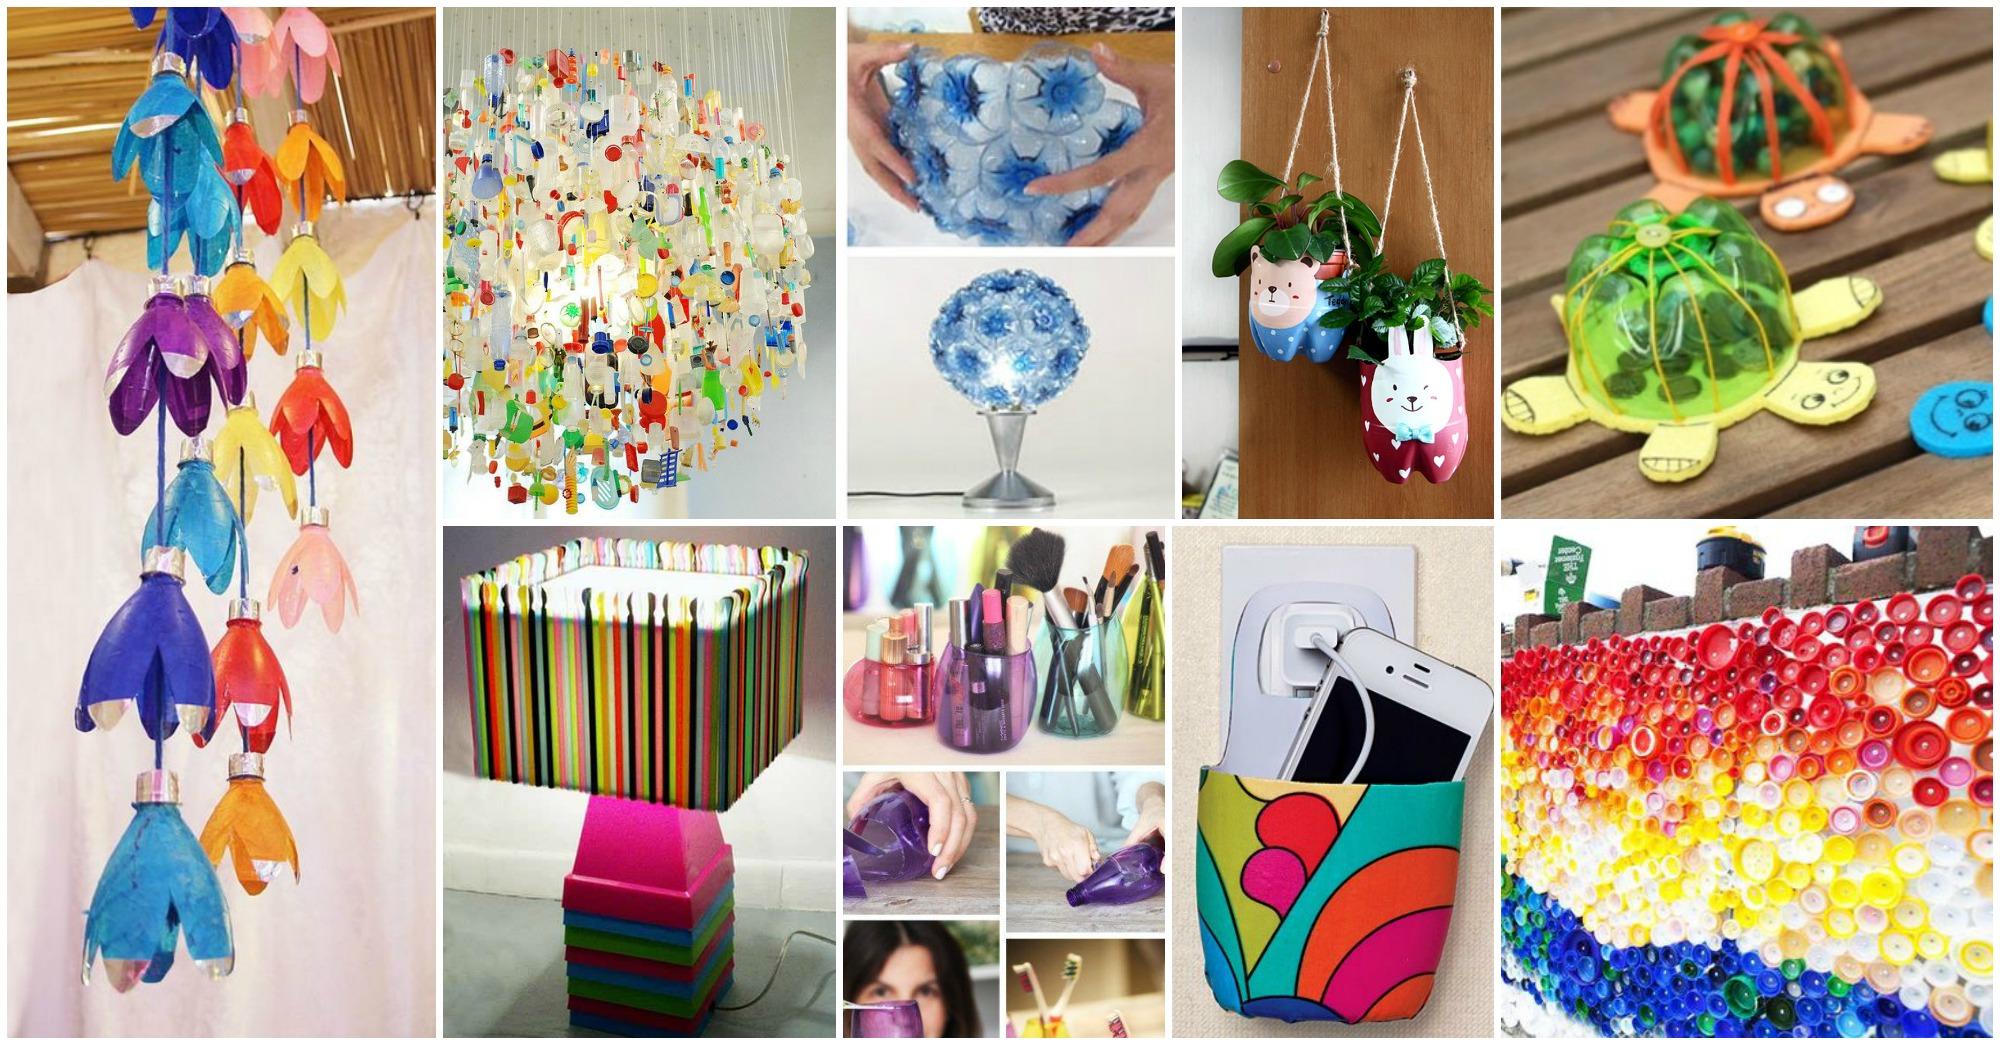 Diy creative recycled plastic crafts for Ideas para decorar tu casa reciclando